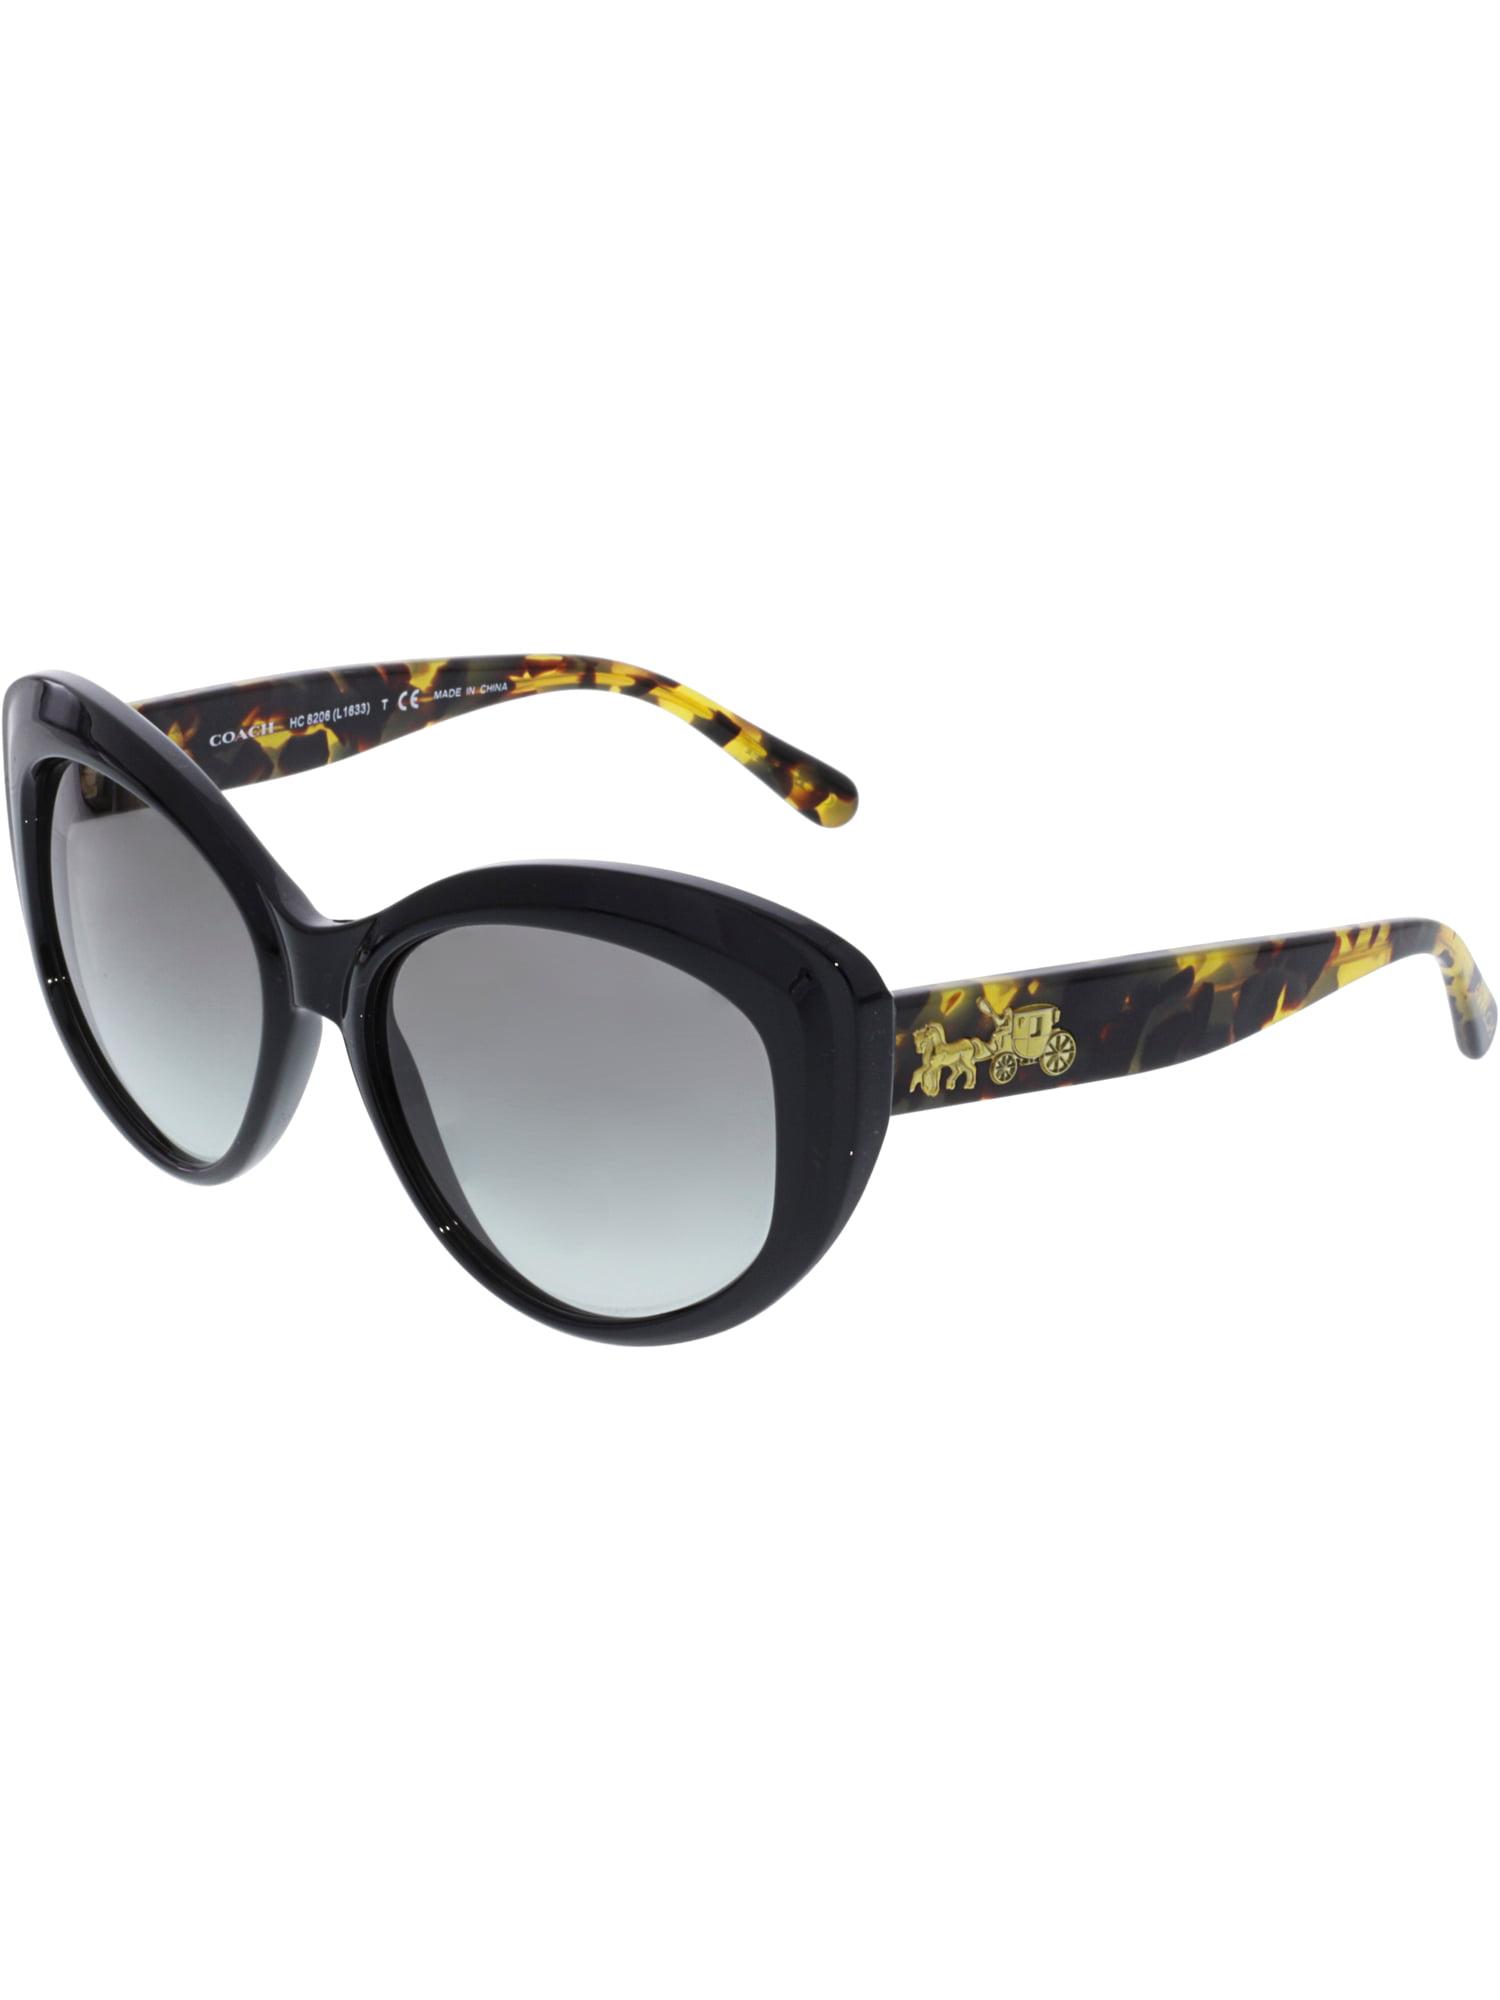 8f176e32d820 ... czech coach womens mirrored hc8206 544911 55 black cat eye sunglasses  c8019 169c6